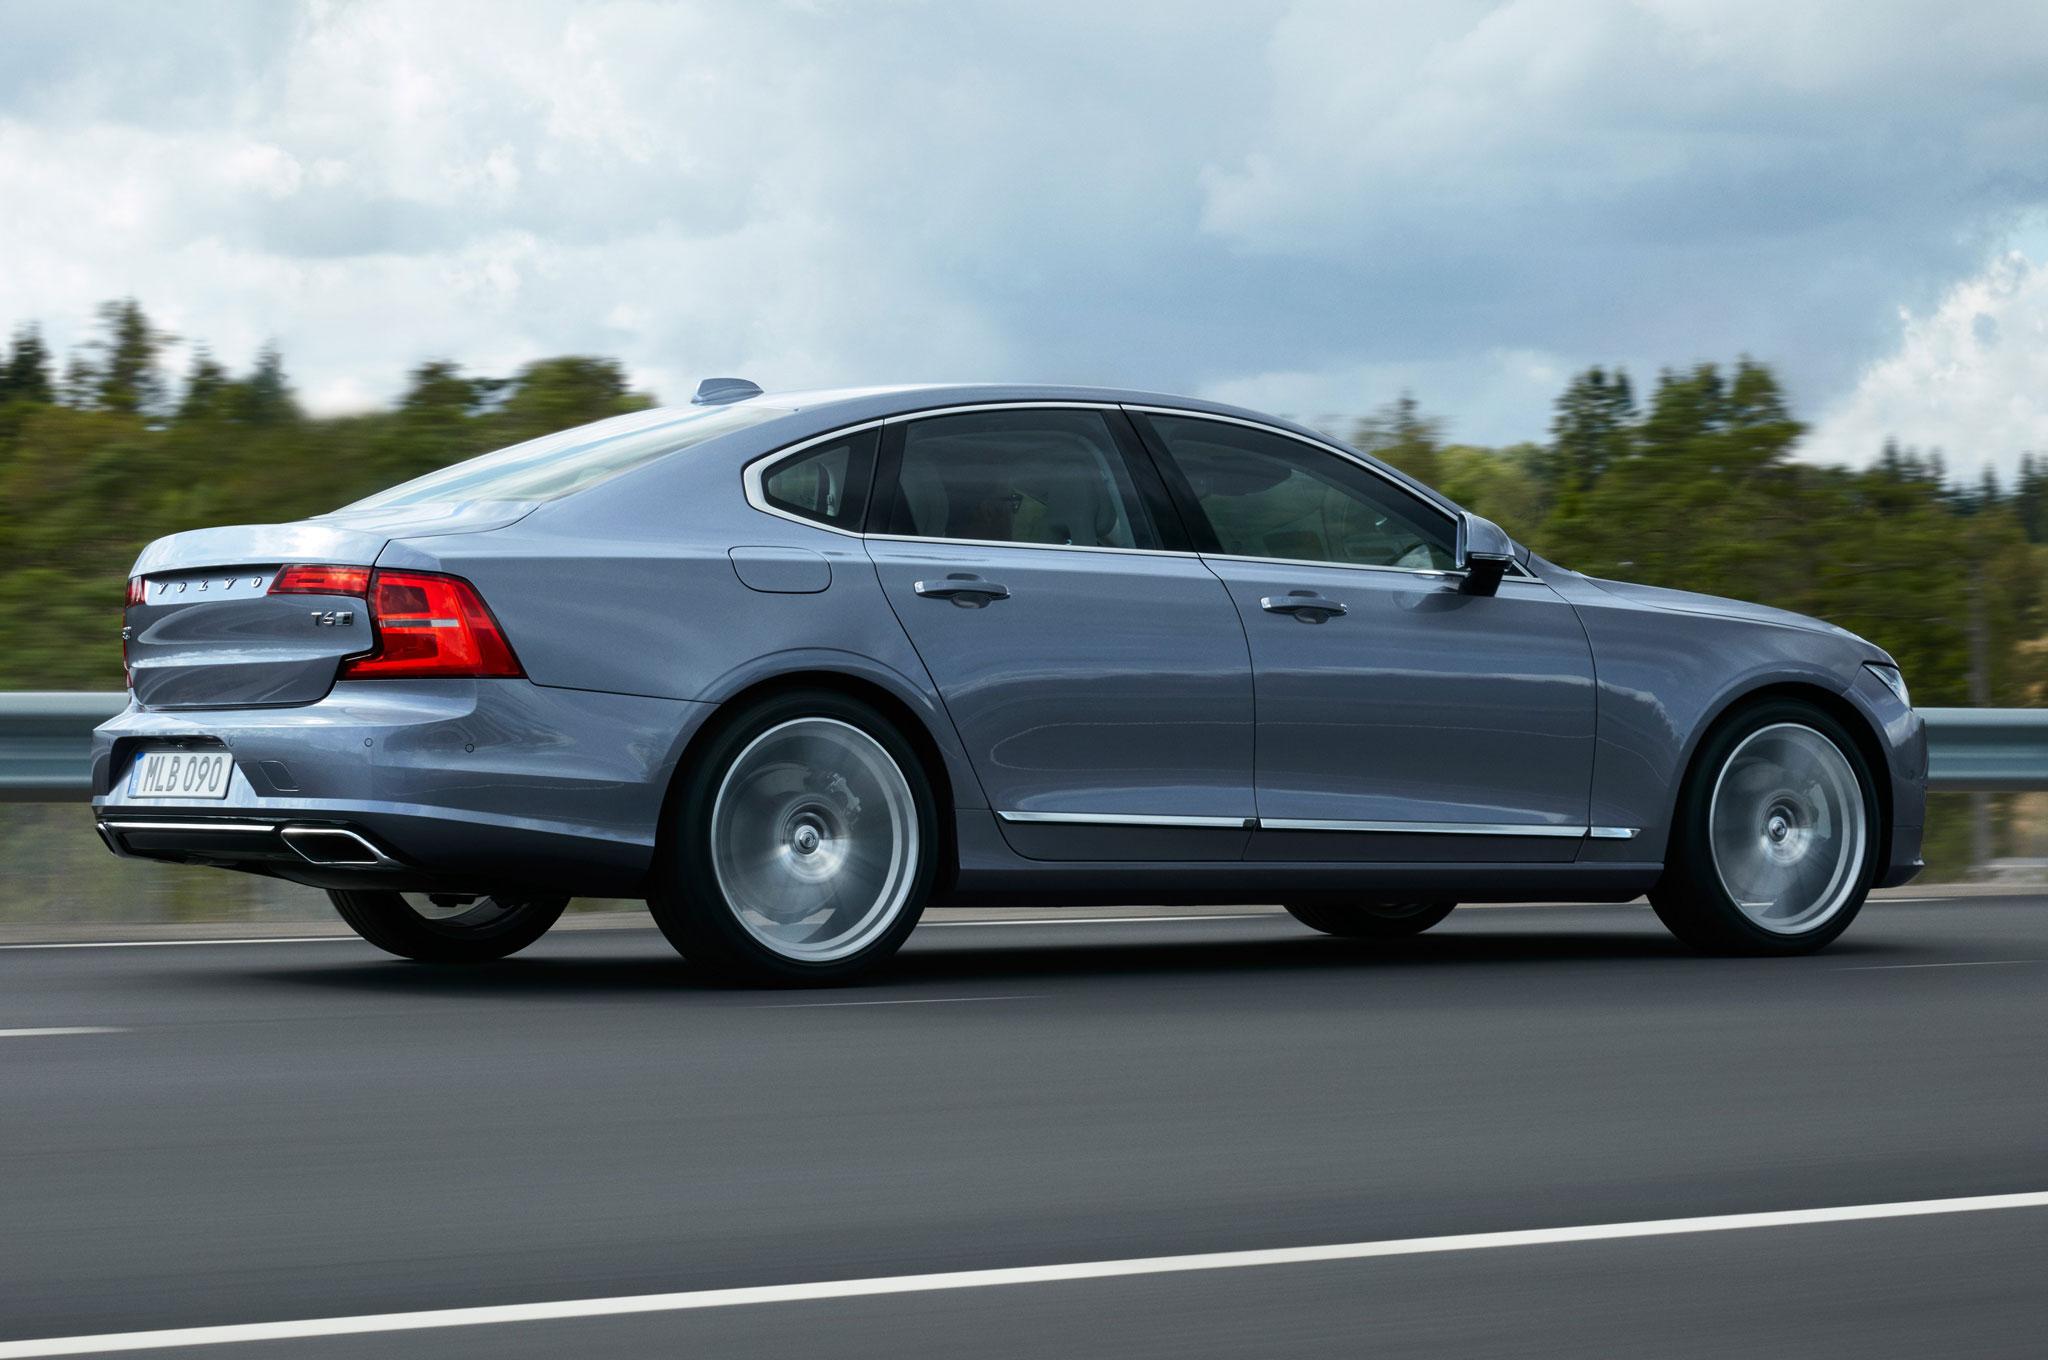 Volvo Luxury Sedan Fully Revealed With Inspired Design